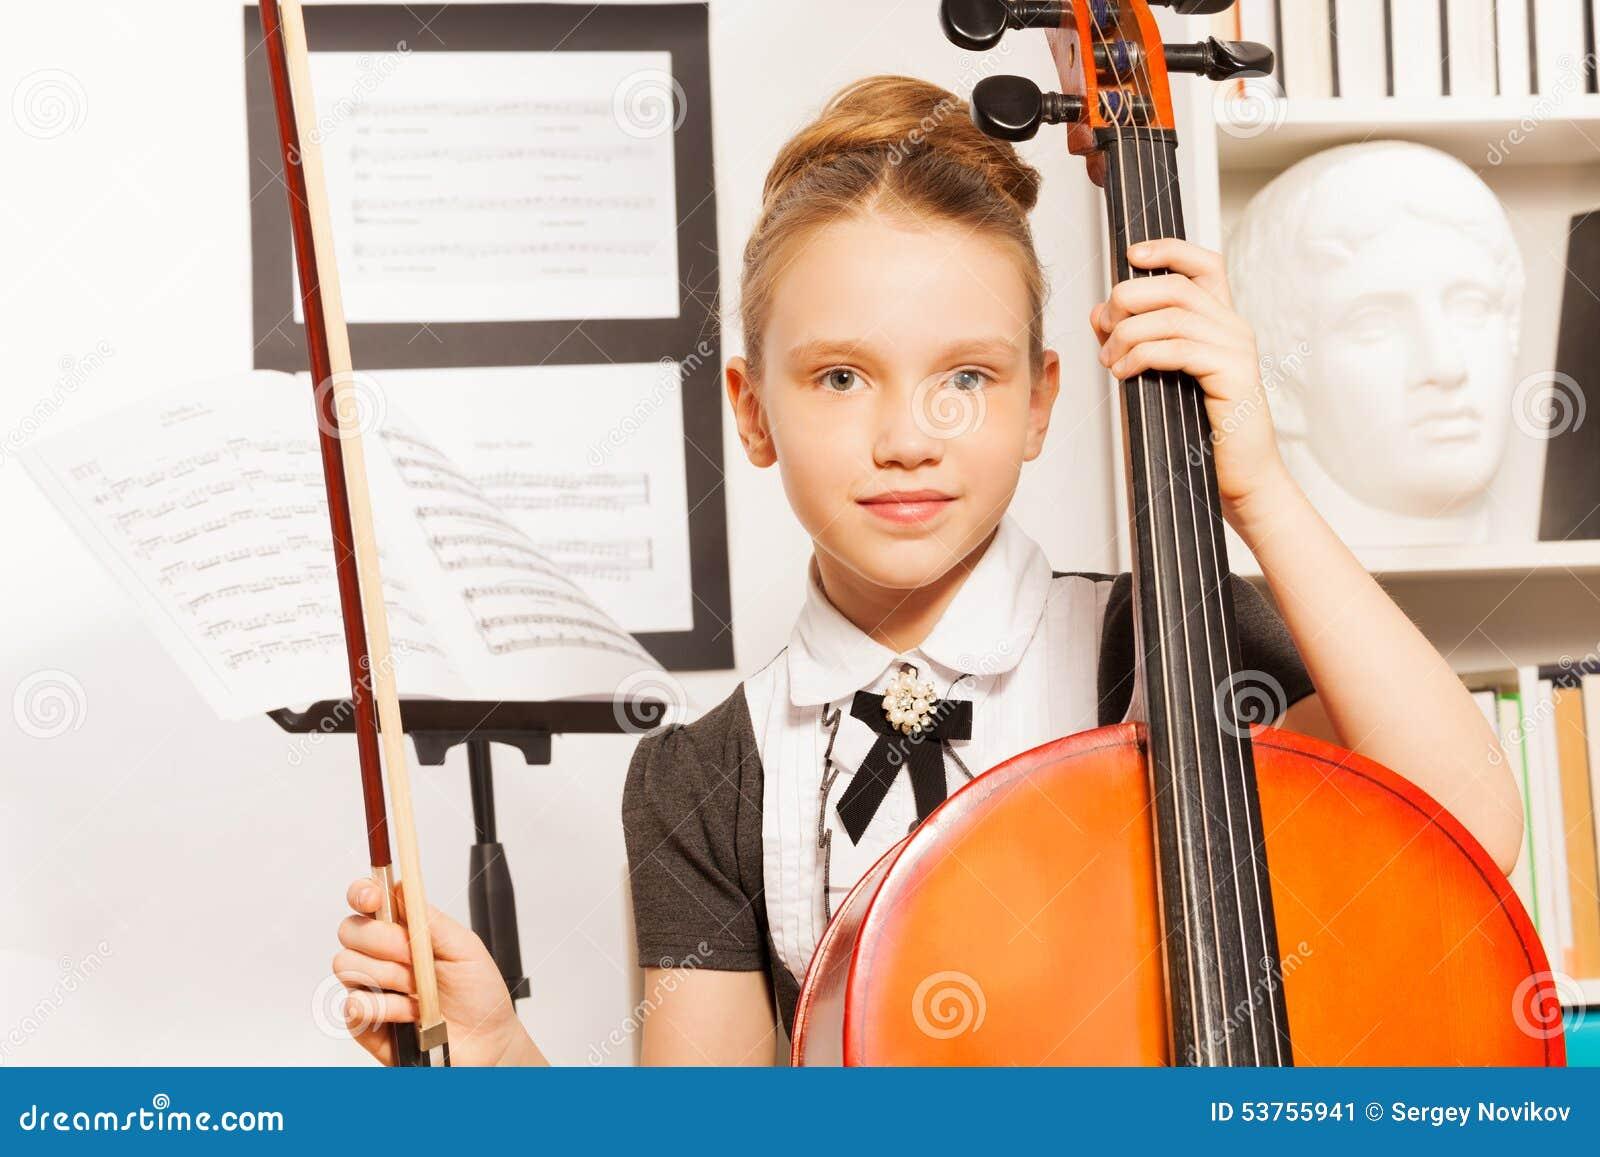 Retrato da menina que guarda a violino-curva para jogar o violoncelo